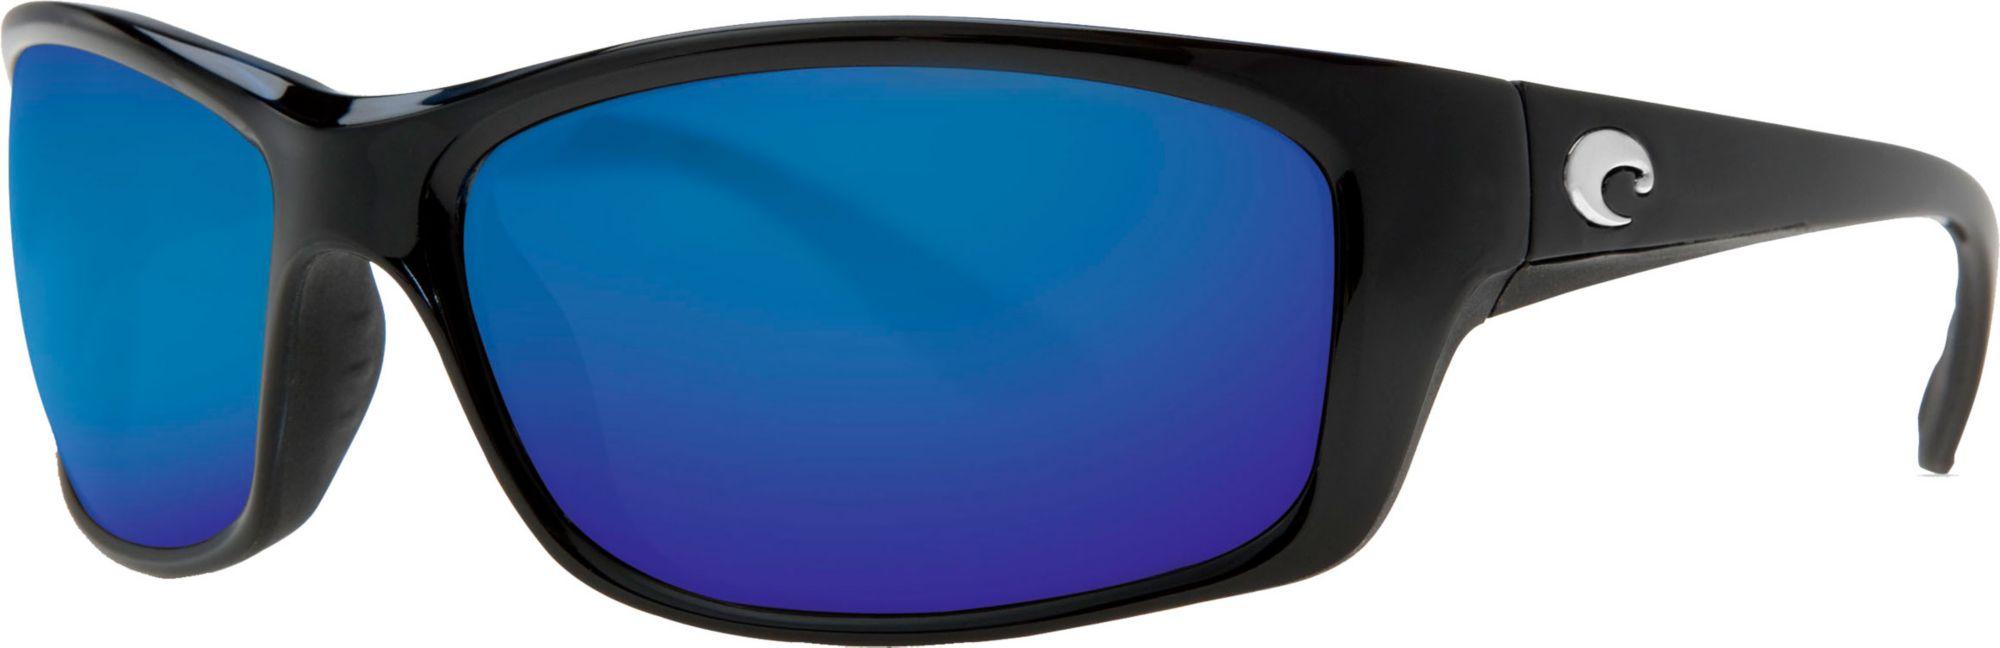 Best Sunglasses in Golf - Costa Del Mar